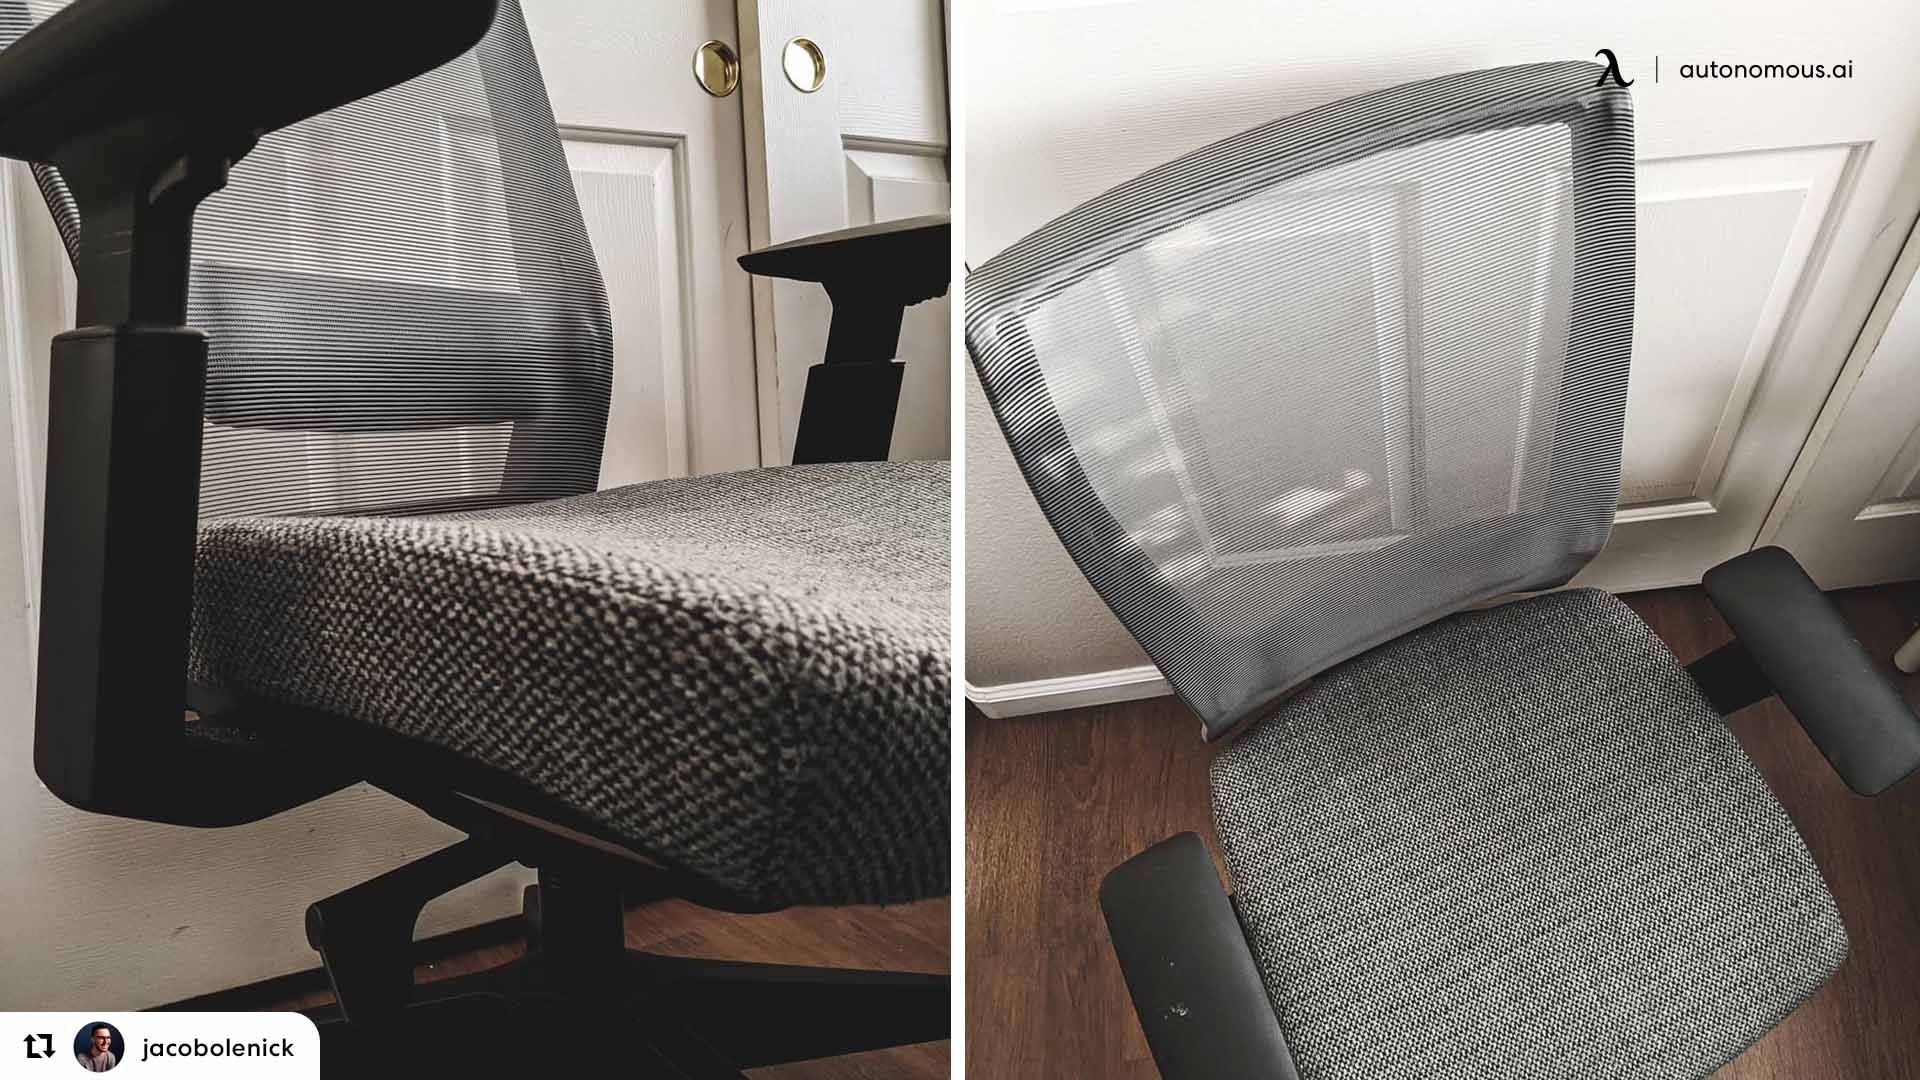 Disadvantages of ergonomic chair